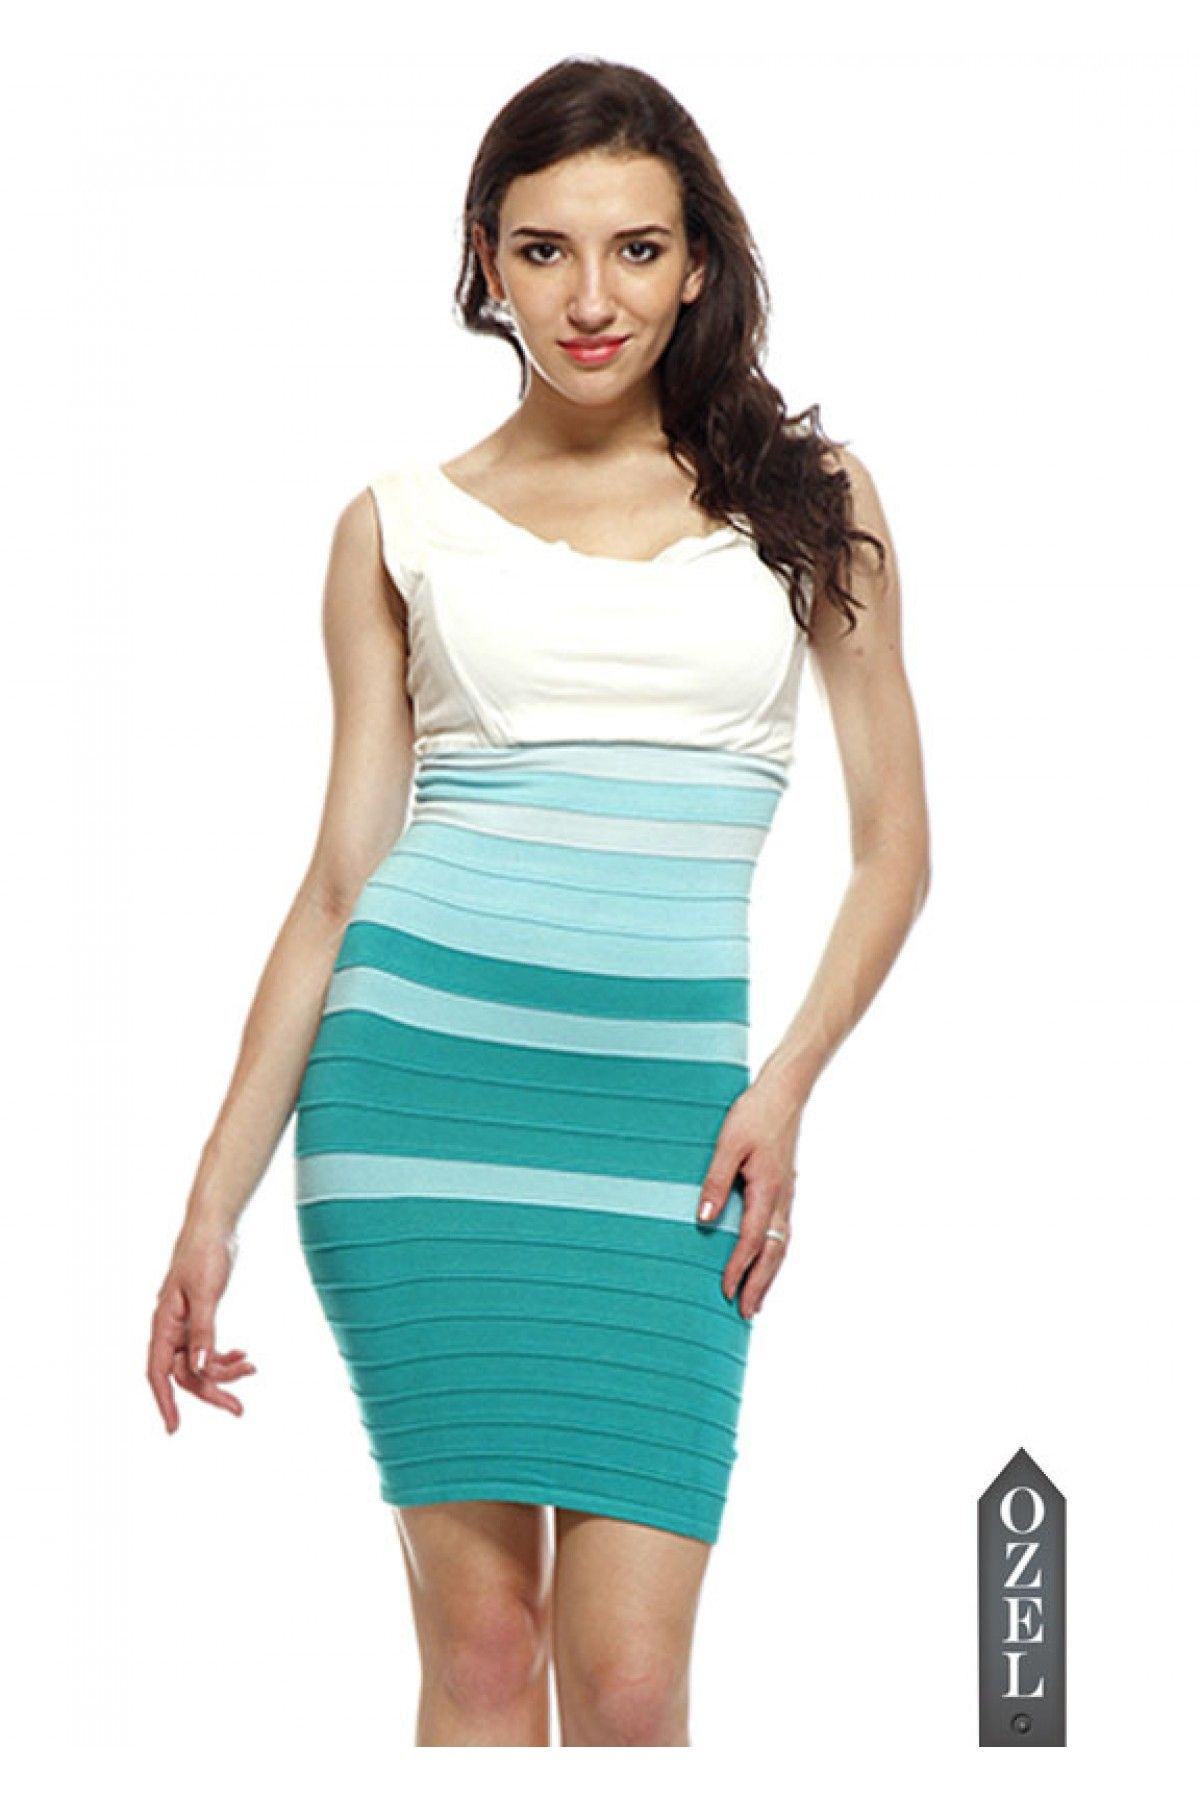 Two In One Bandage Dress by Ozel Studio | OZEL Studio Couture ...